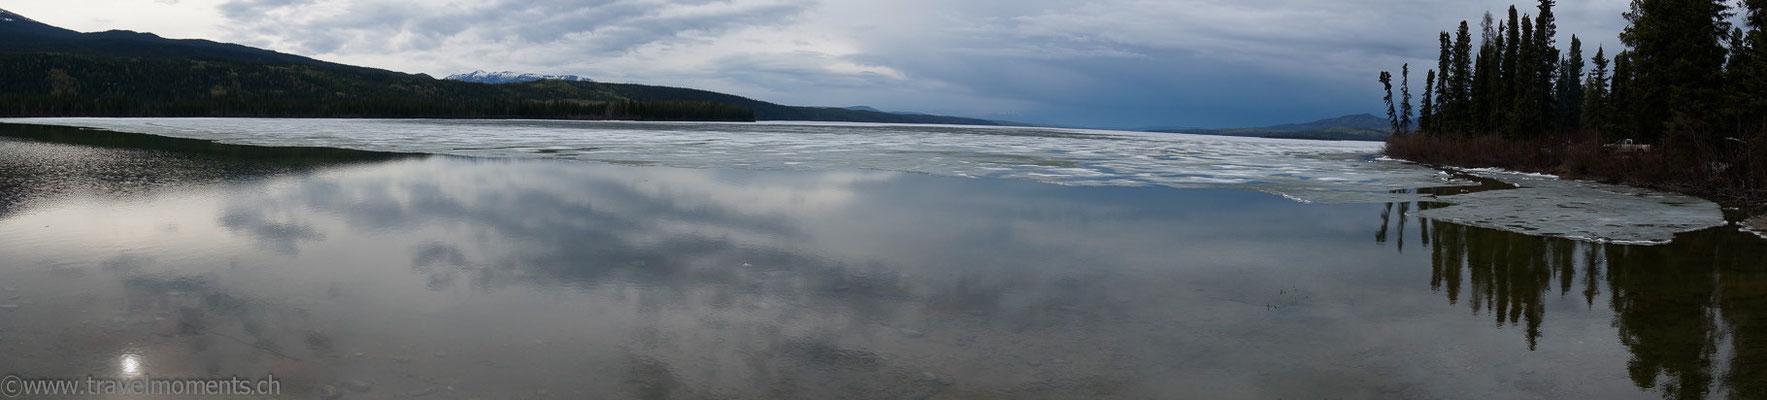 Simpson Lake